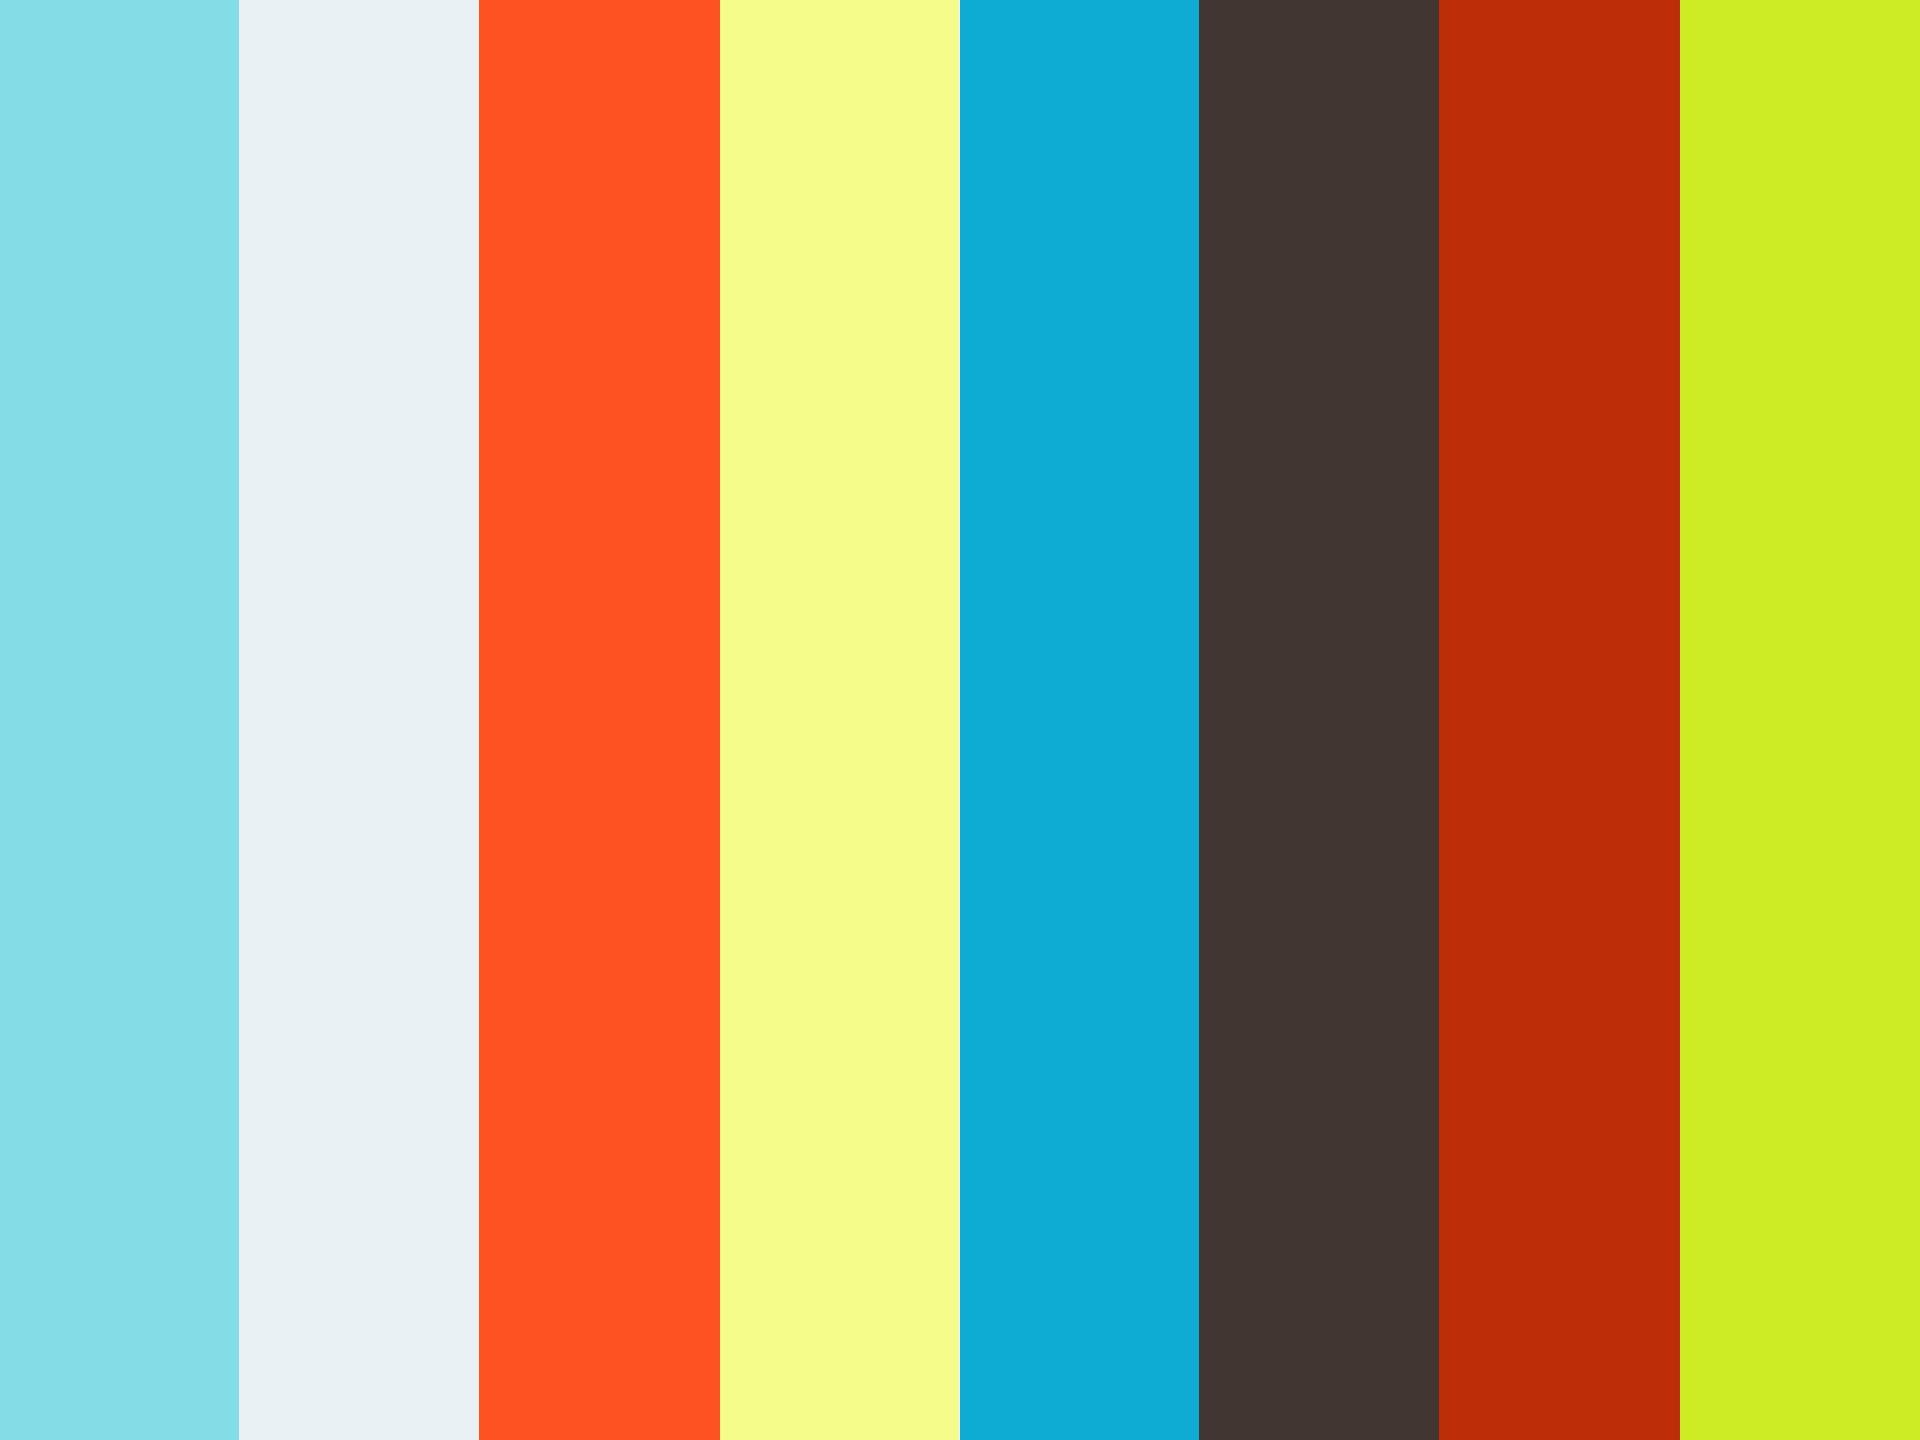 CHEVROLET MALIBU LT - BLUE - 2019